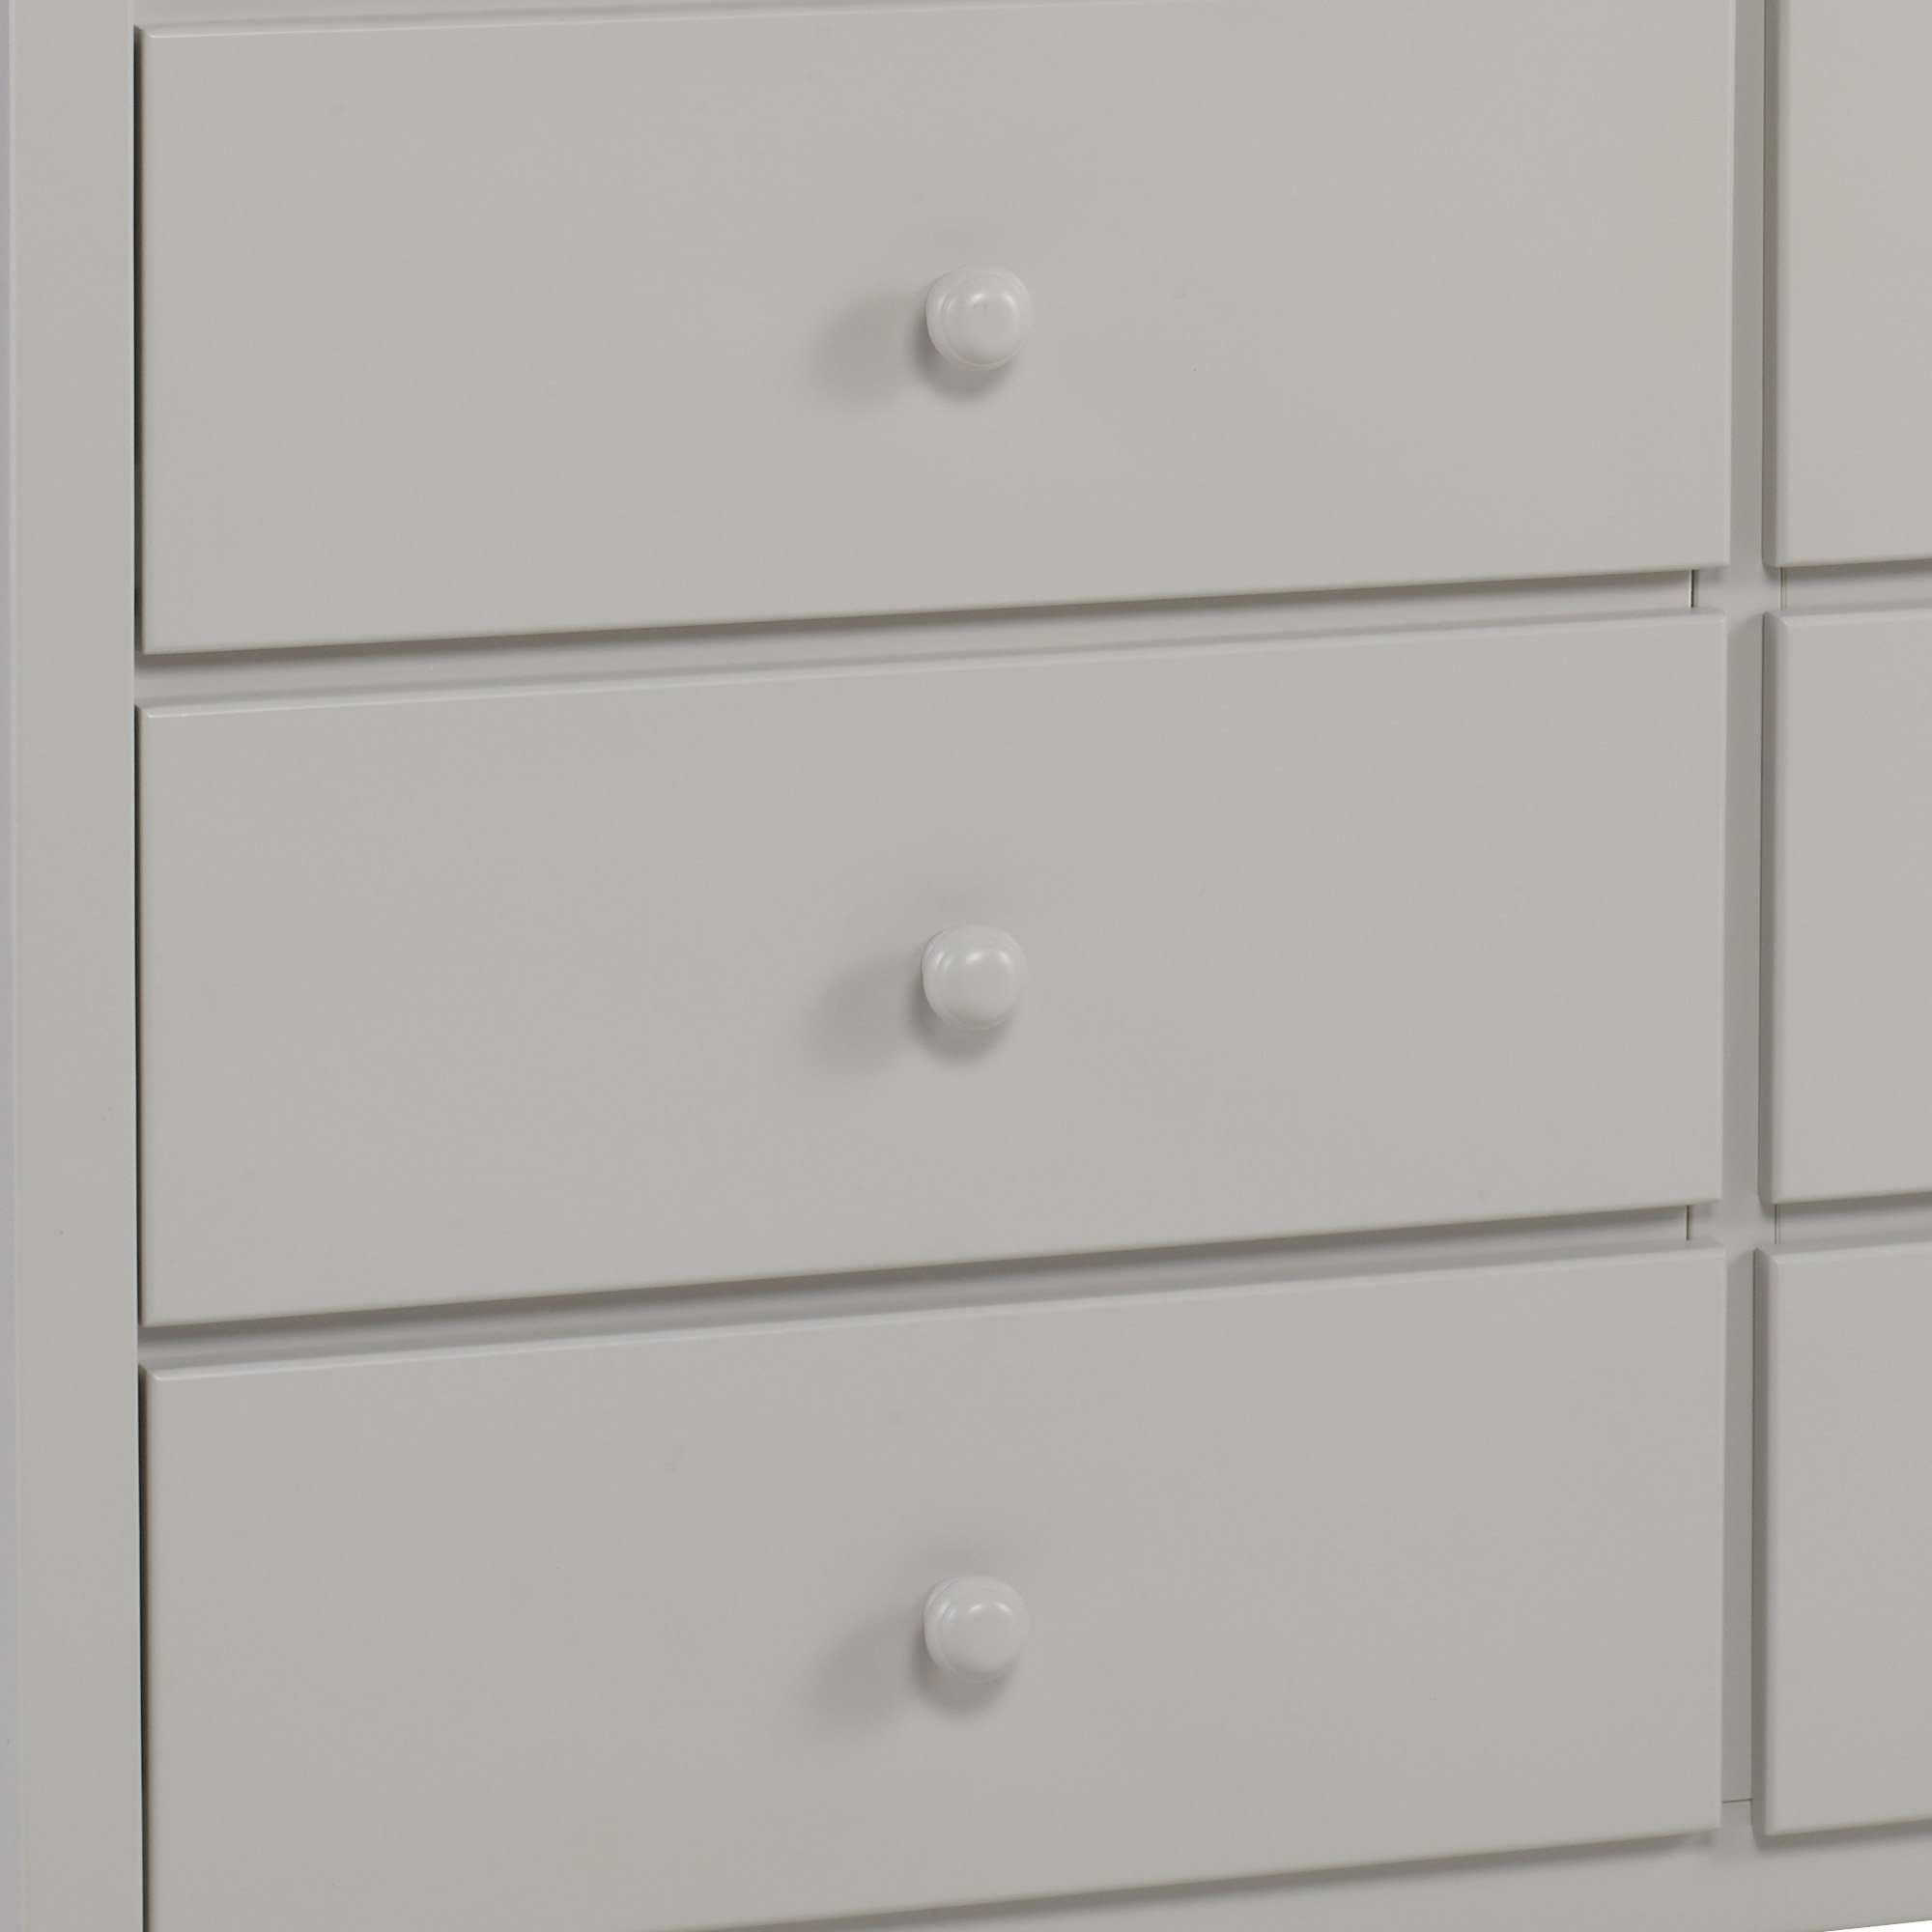 wayfair bee white pdp dresser furniture reviews double harriet barra ca drawer